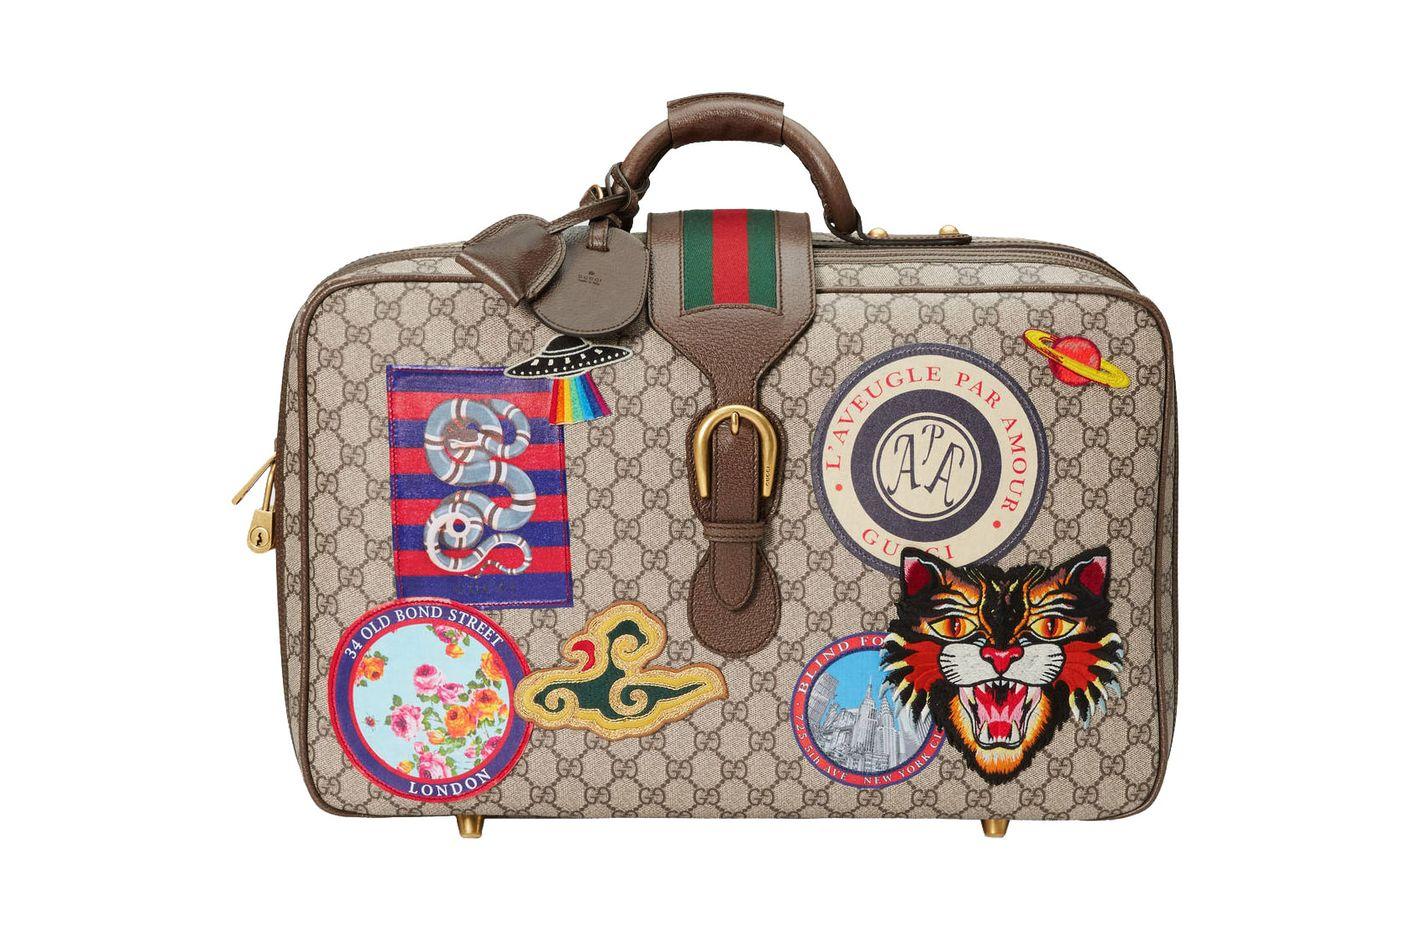 Gucci Courrier GG Supreme Suitcase